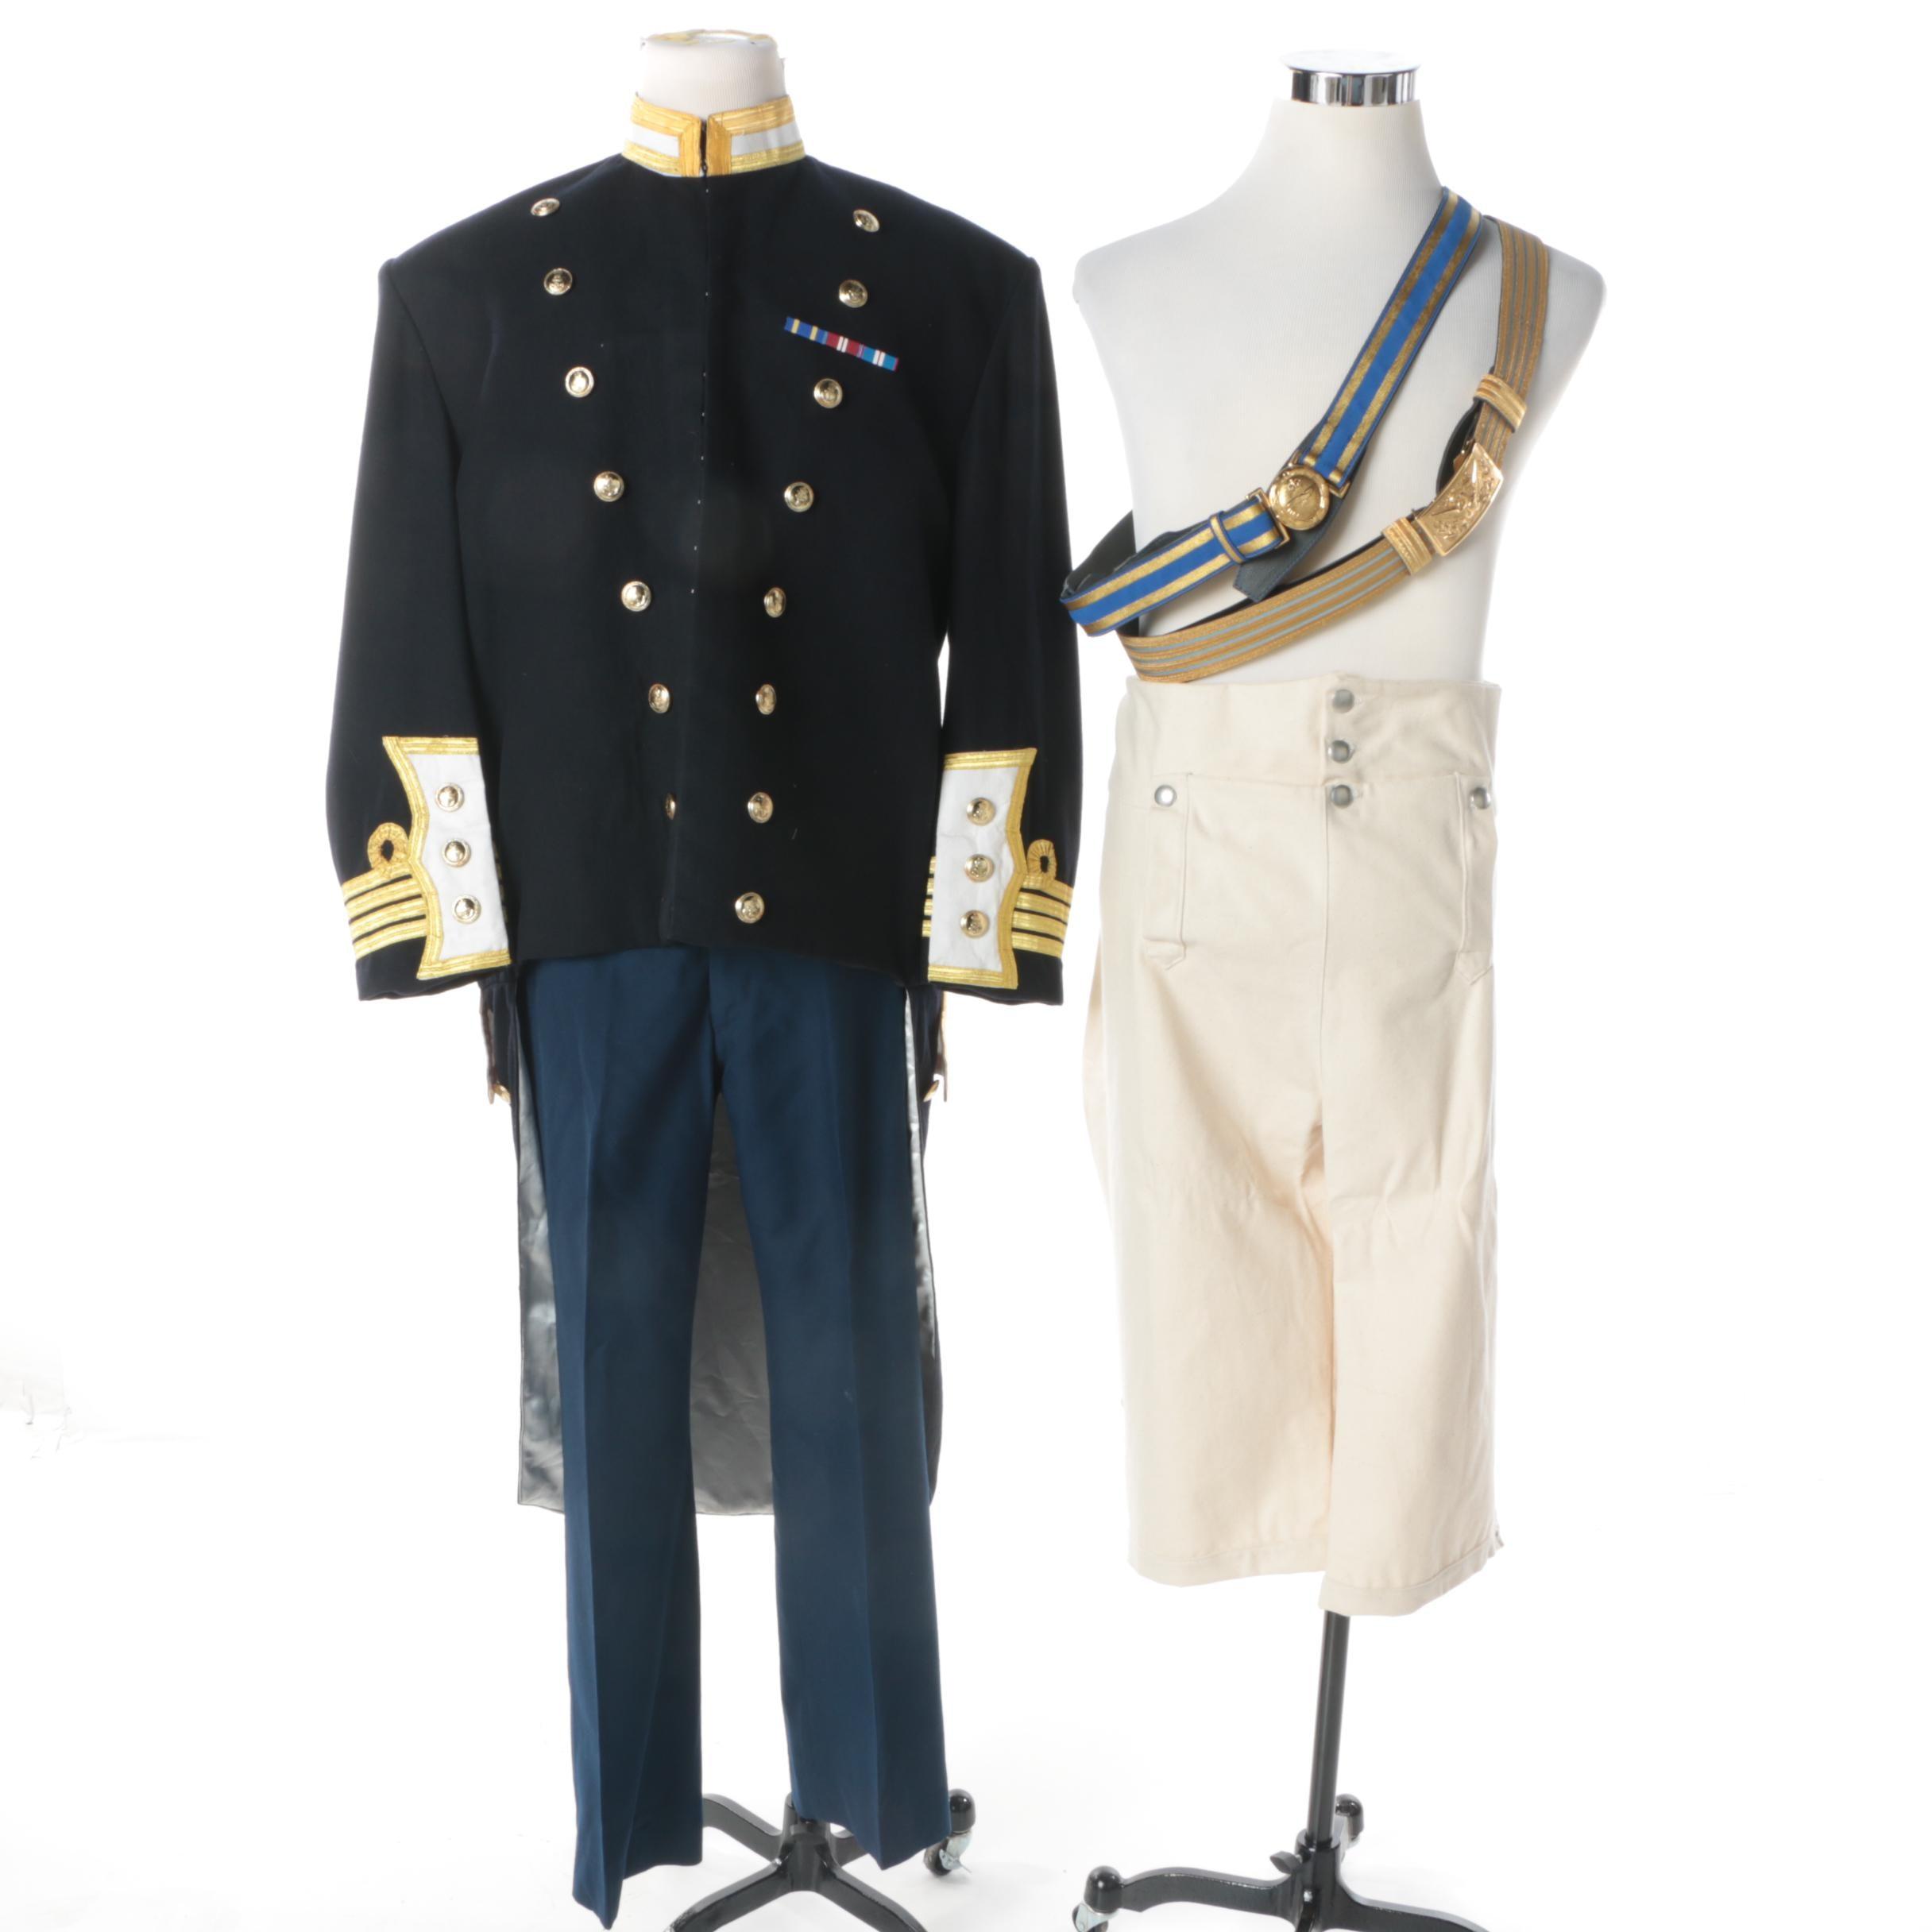 Men's Replica Royal Navy Uniform, Pants and Belts